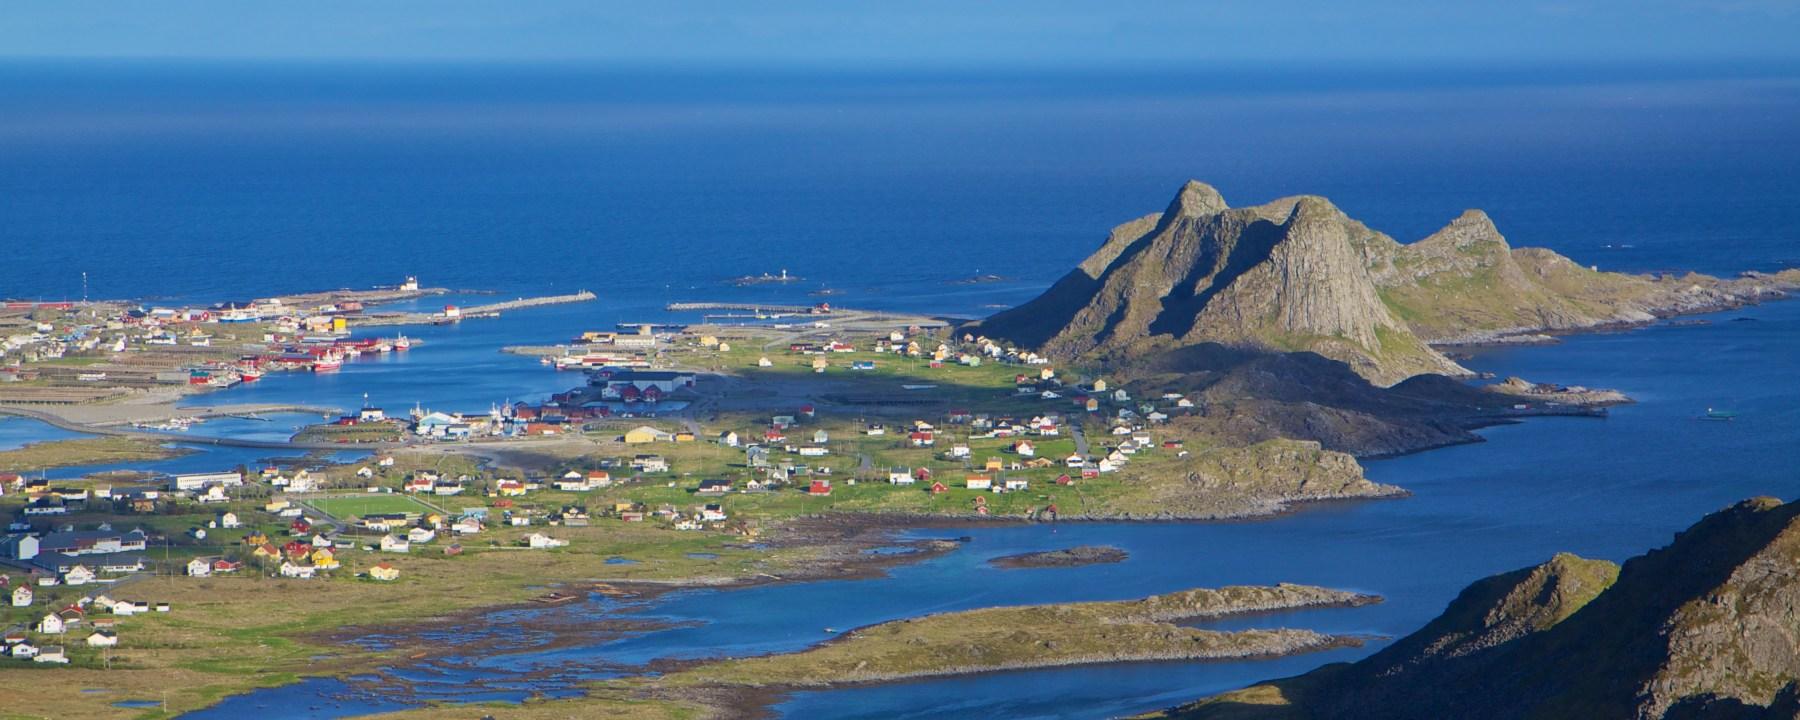 Fishing port on Lofoten